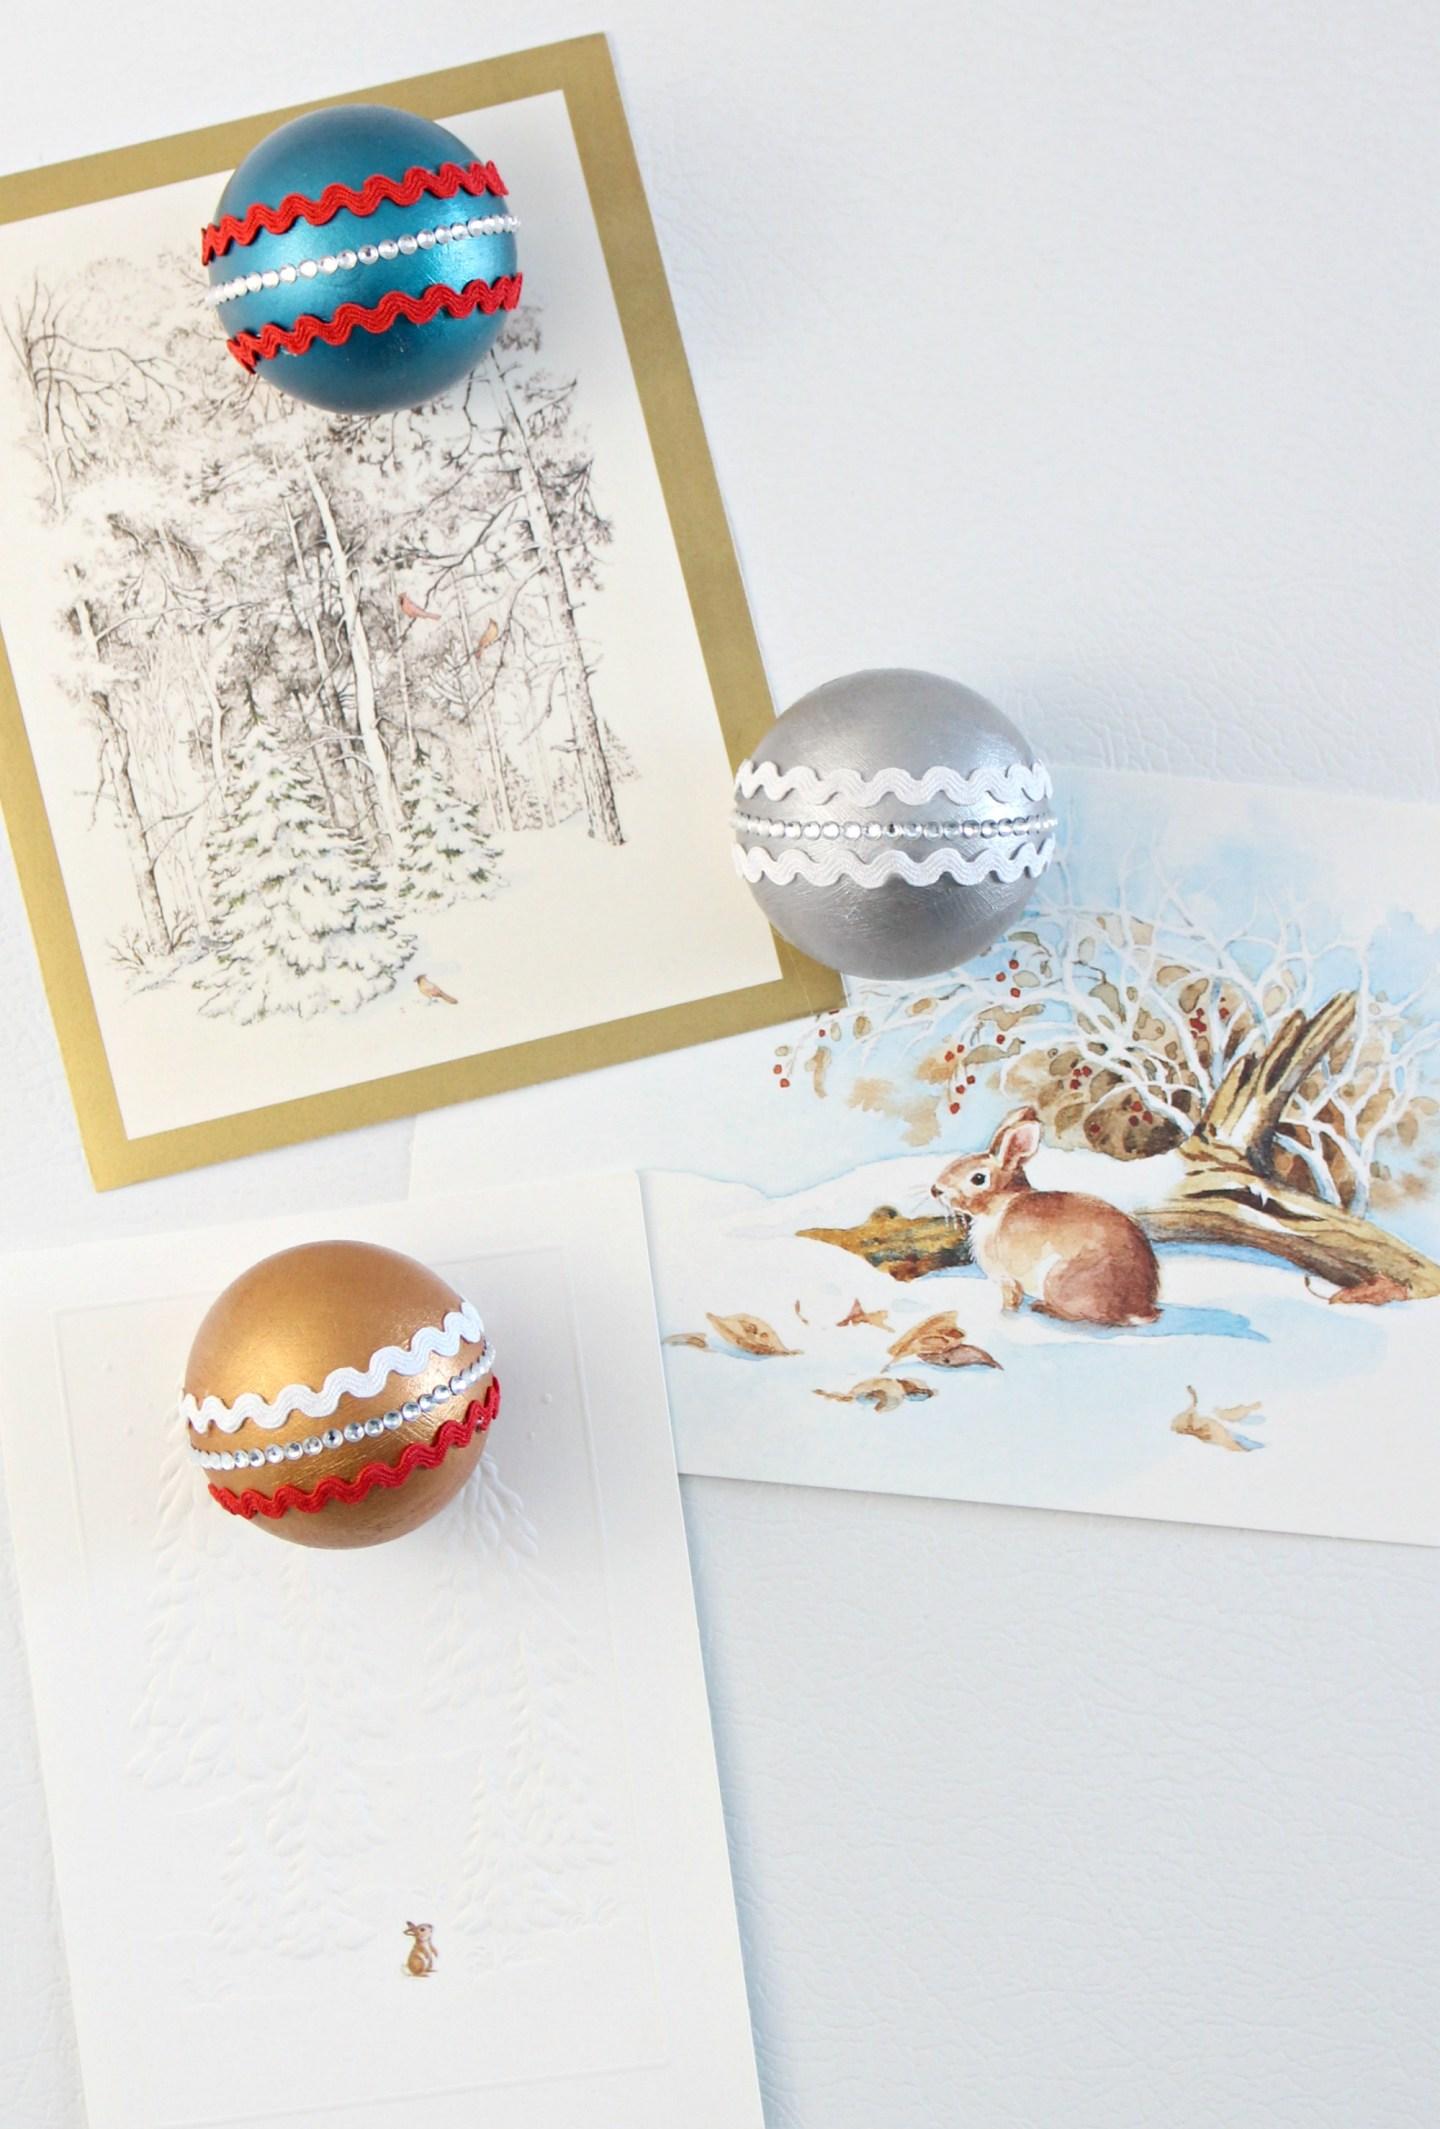 DIY Vintage Ornament Inspired Magnets   Mid-Century Inspired Christmas Decor   Retro Christmas Craft Ideas   Dans le Lakehouse #christmas #ornament #vintageornament #carddisplay